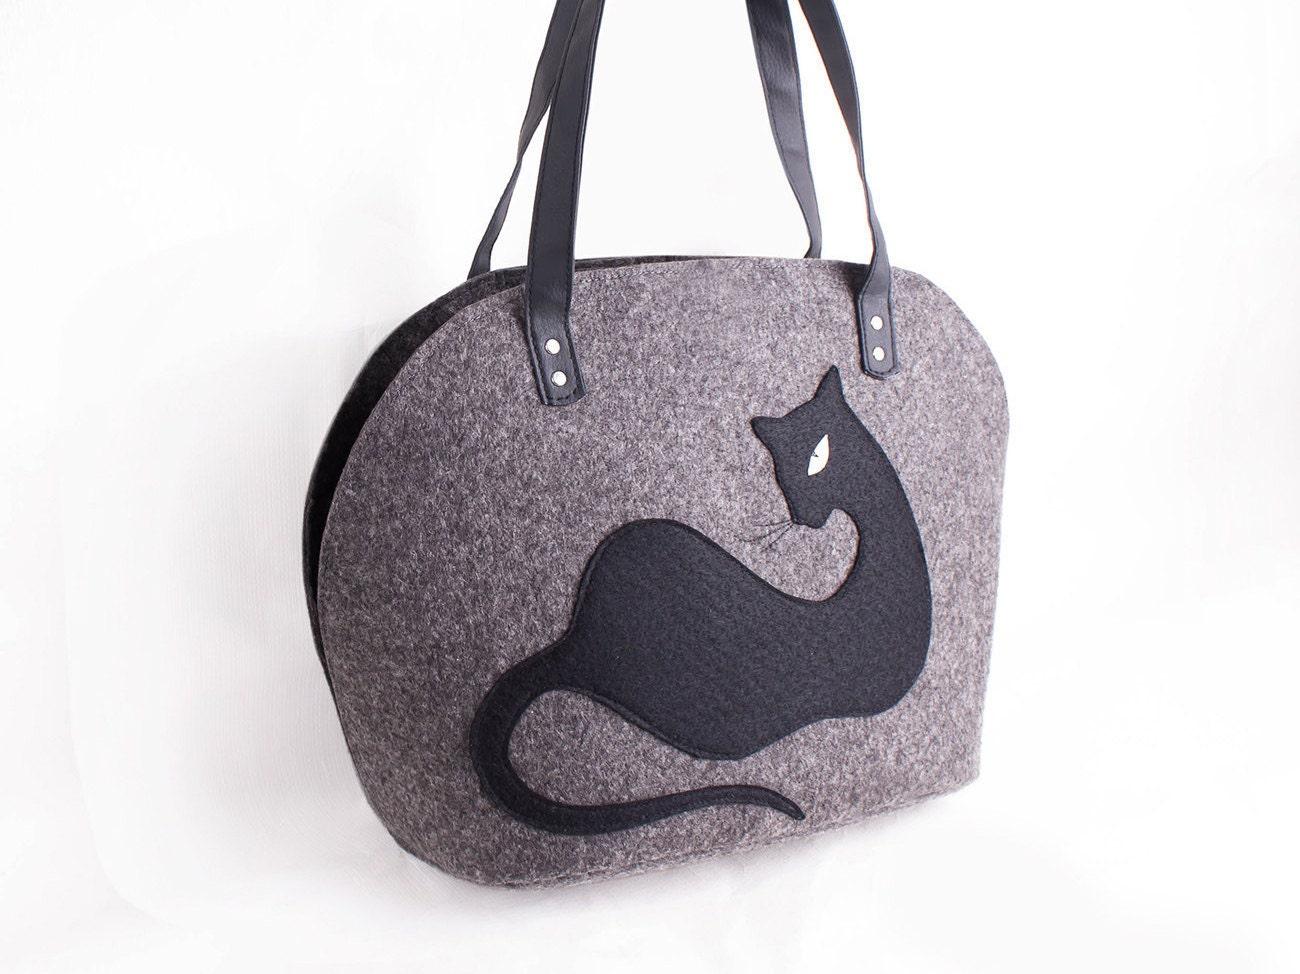 images online bag love to grip on backpack purse pinterest bags deena best crossbody jaguar only ozzy handbags